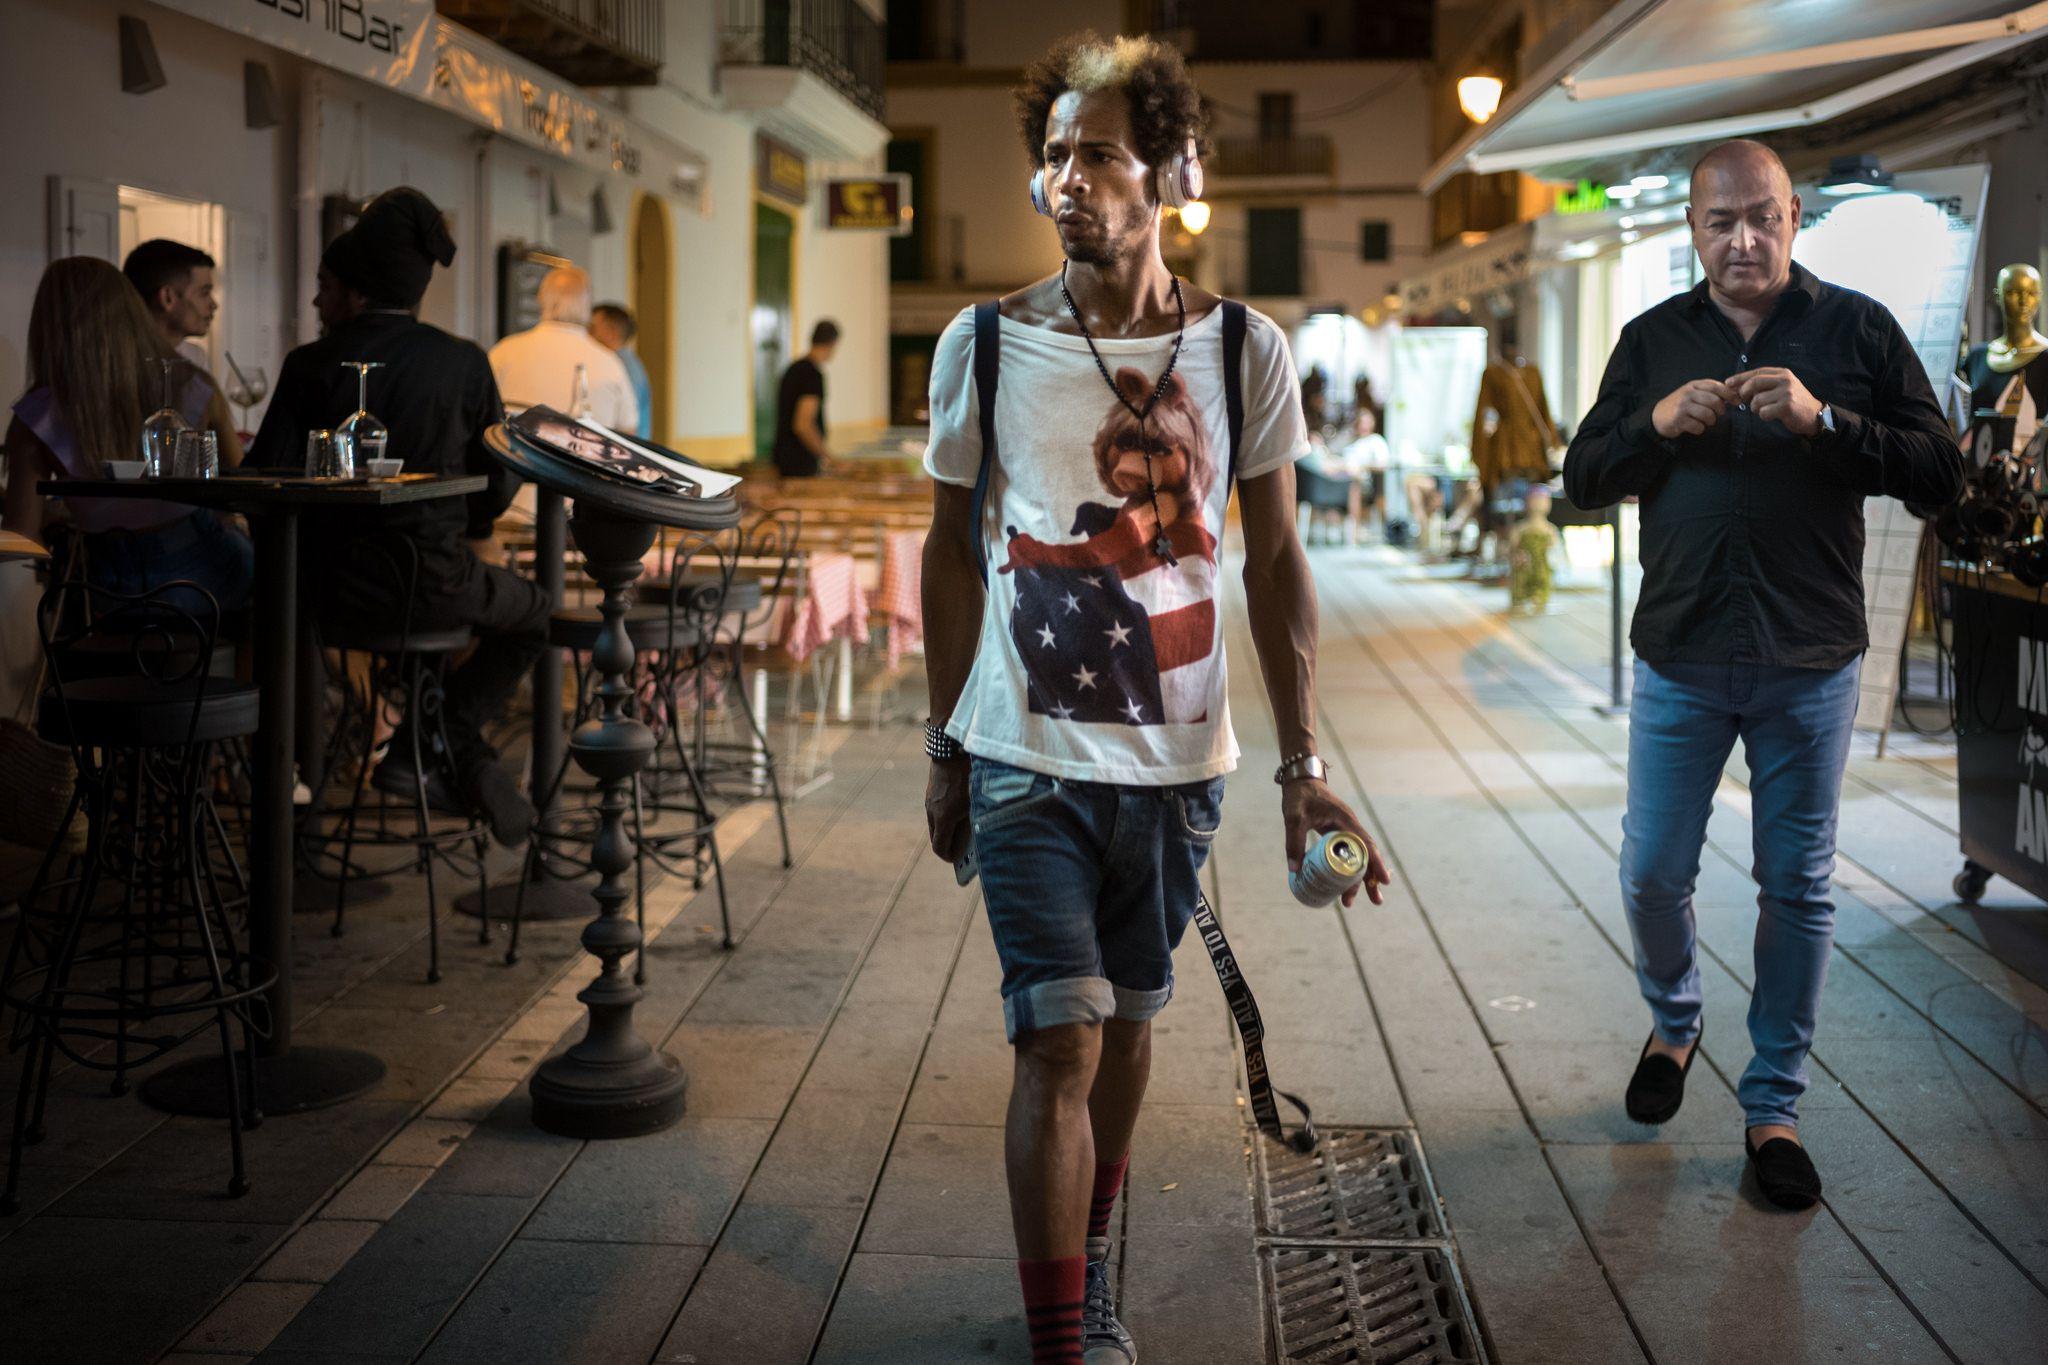 https://flic.kr/p/WYSZhU | Bes | Ibiza. 07.07.2017 Leica M10; 35mm Summilux.